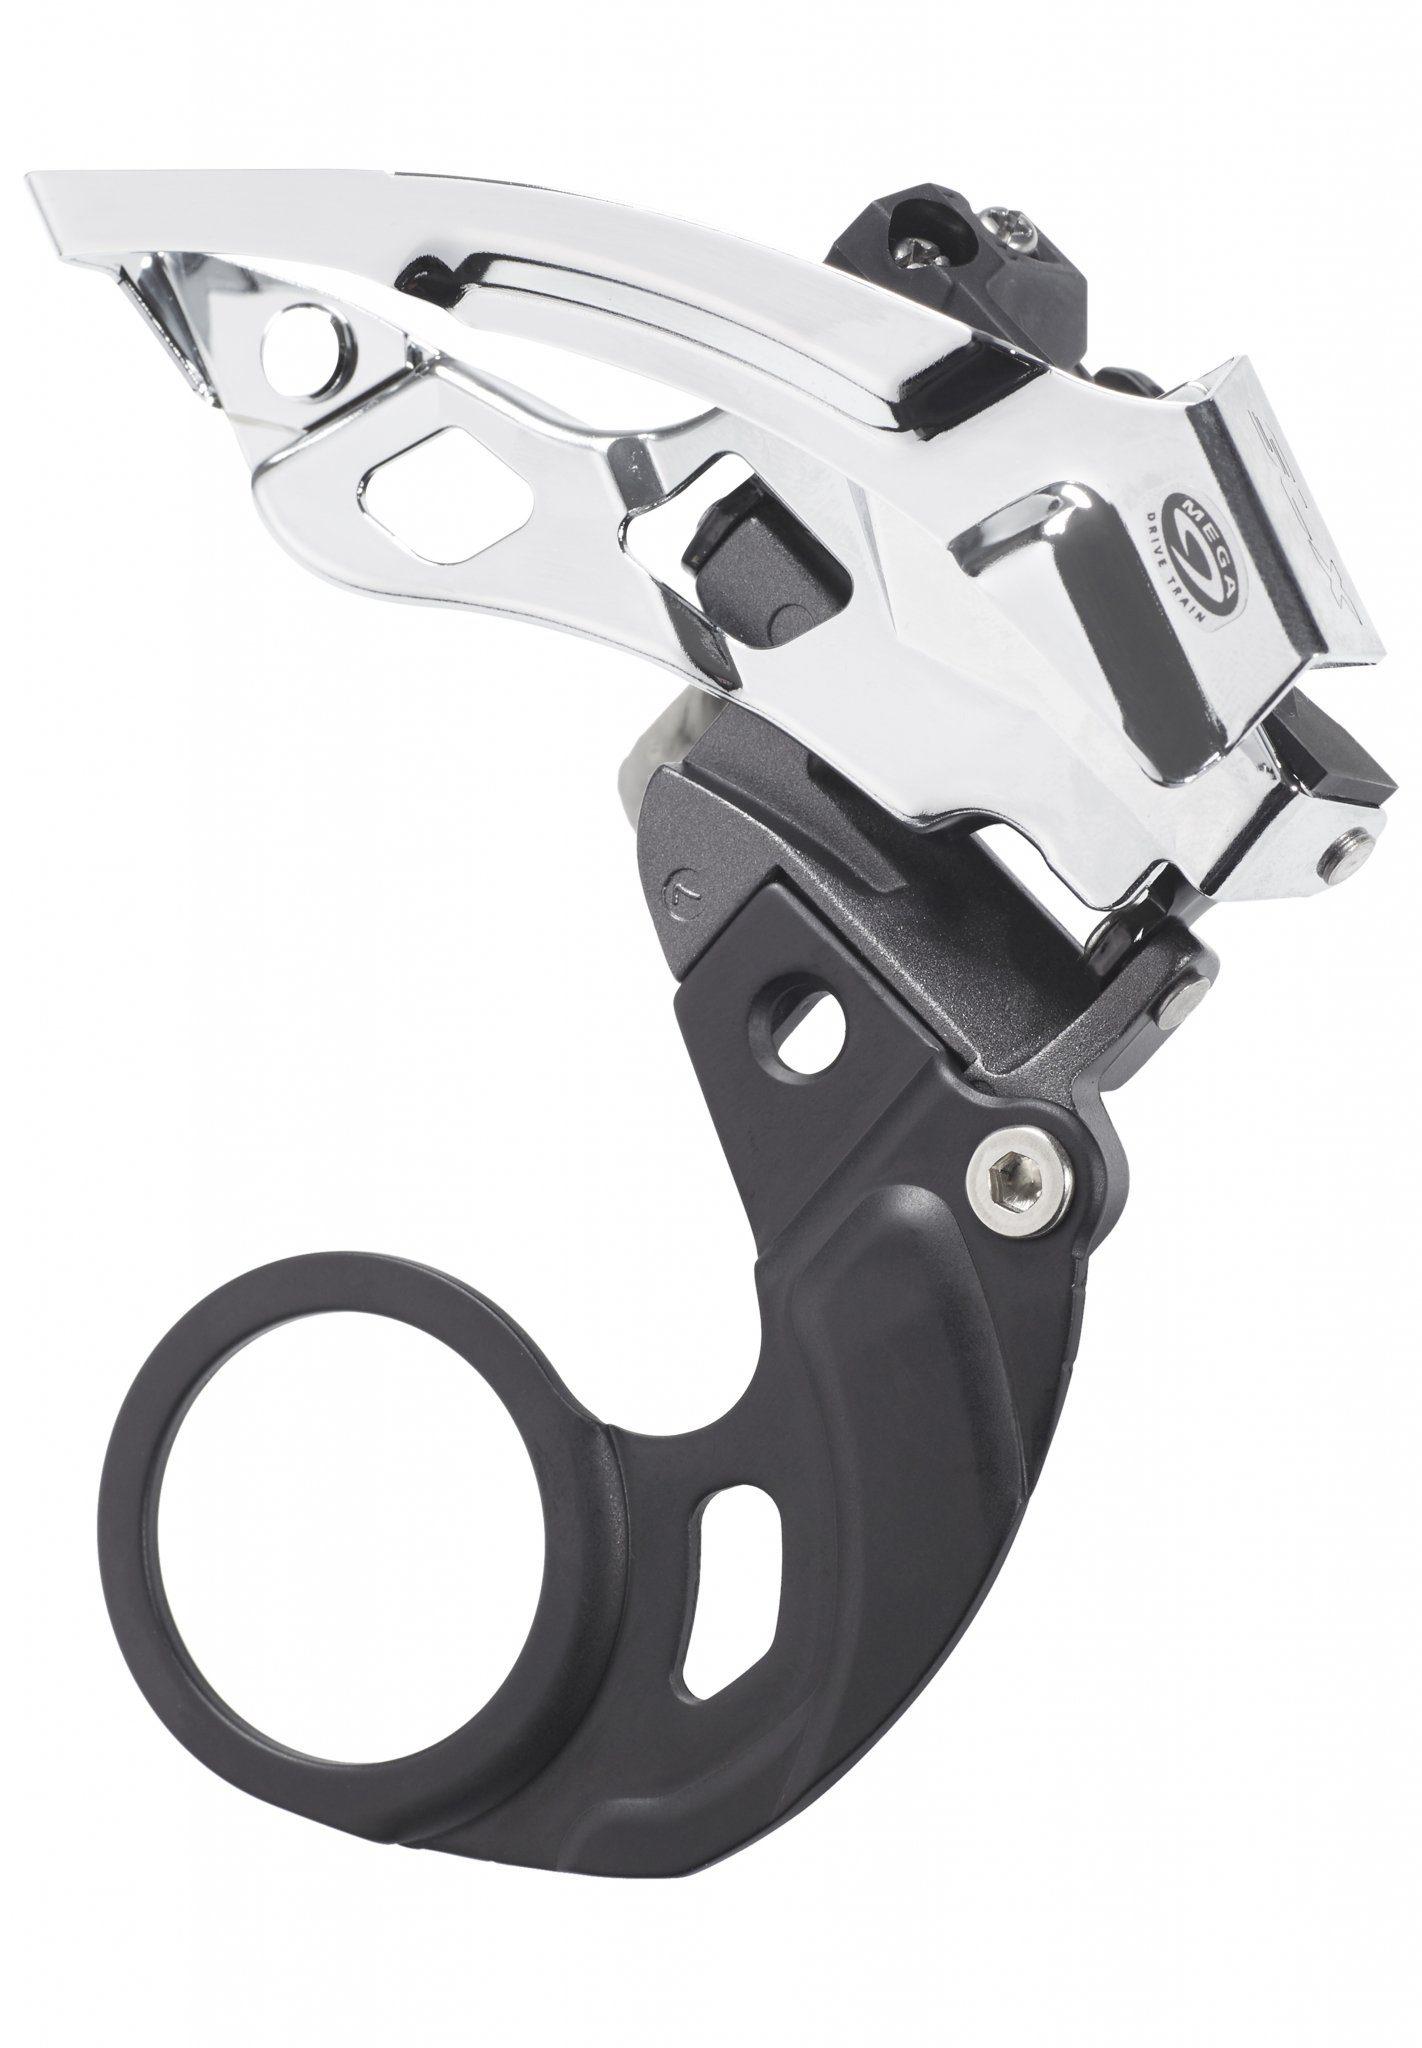 Shimano Schaltung »Shimano SLX FD-M660 Umwerfer 3-fach T-SW«